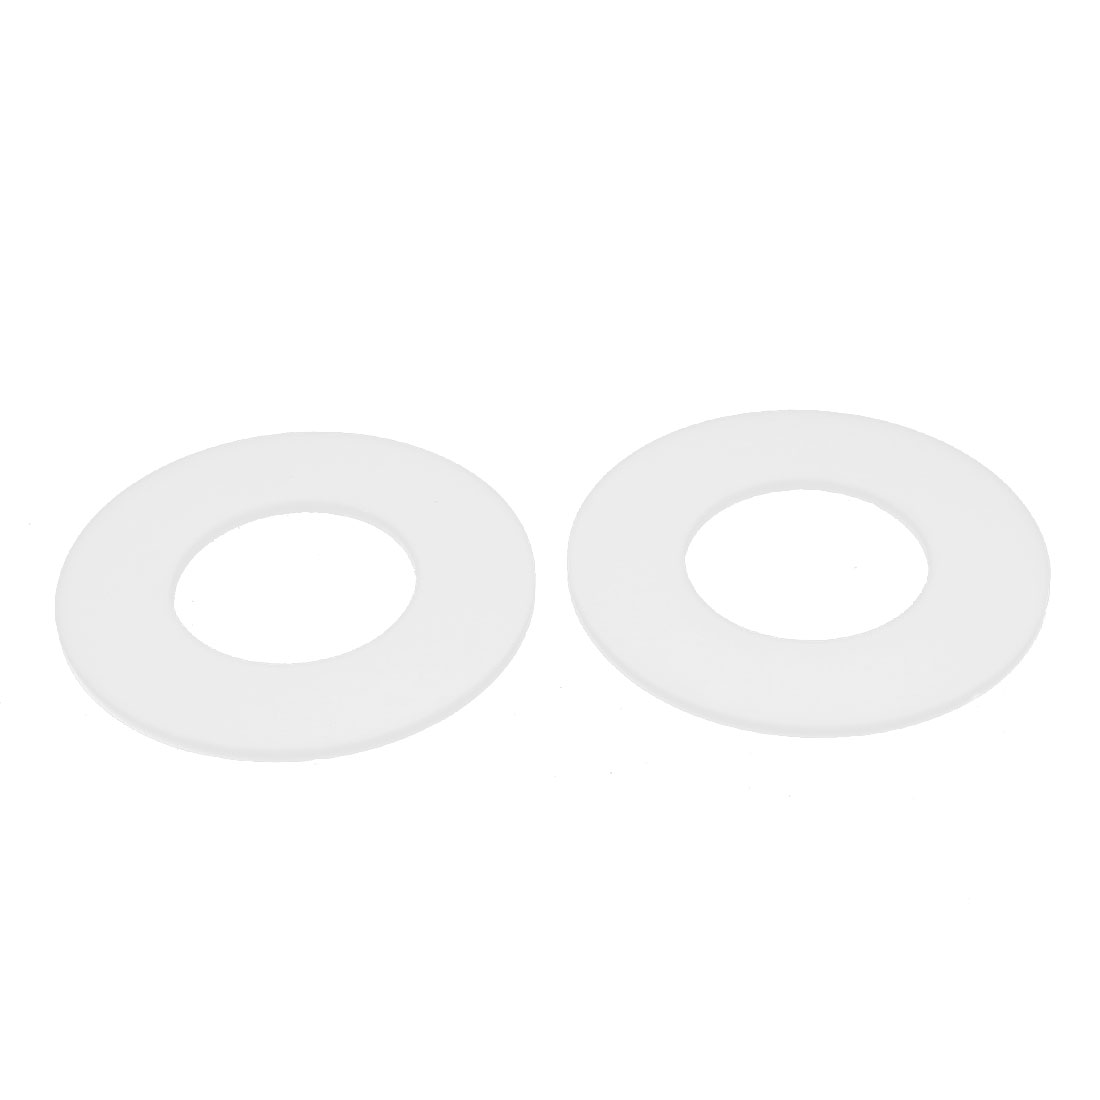 DN40 45x88x3mm PTFE Flange Gasket Sanitary Pipe Fitting Ferrules White 2pcs